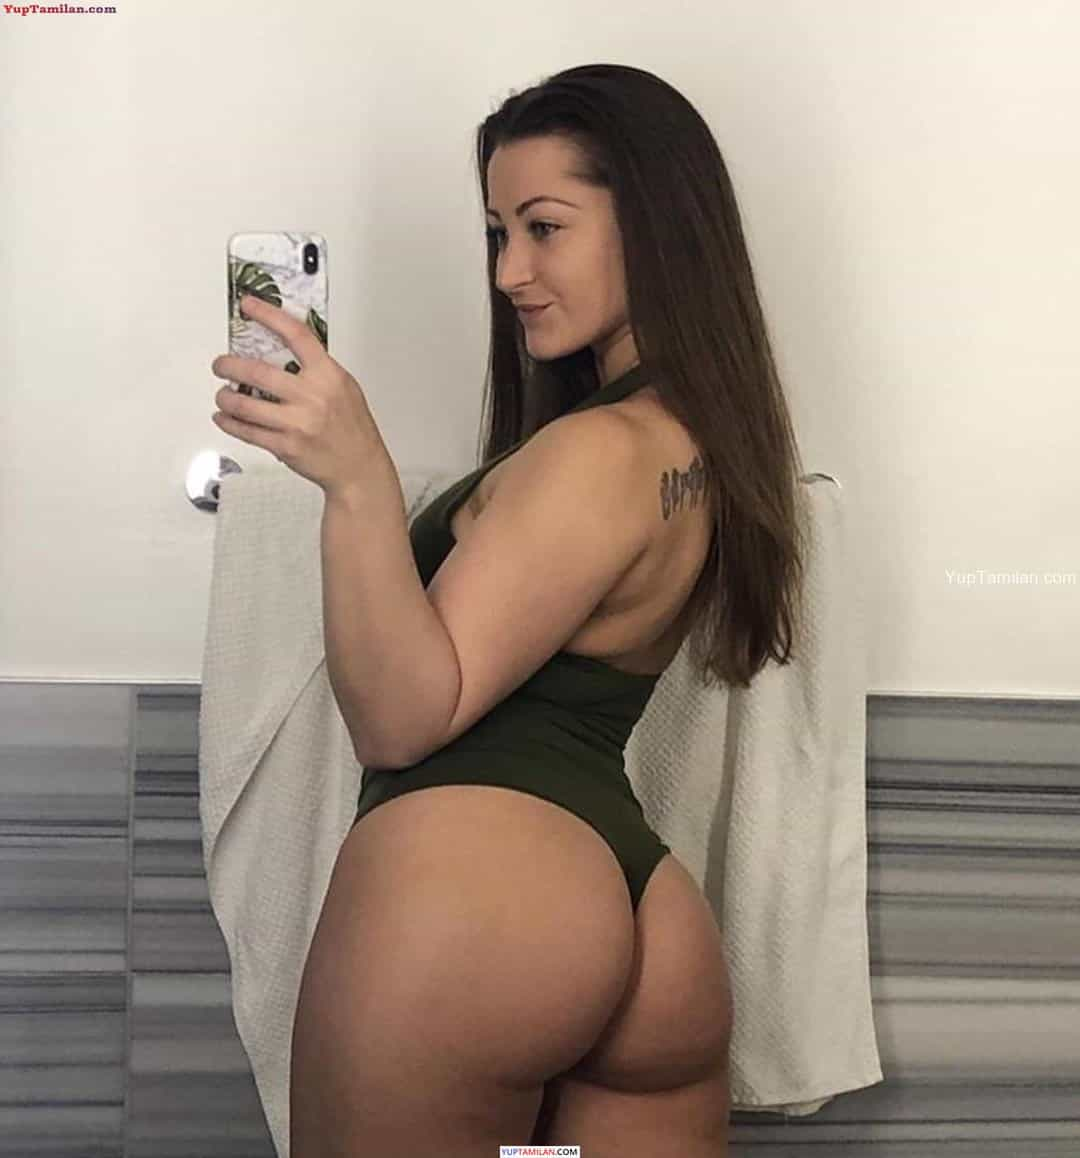 Dani Daniels sexy Lingerie, Bra Images, Butt show